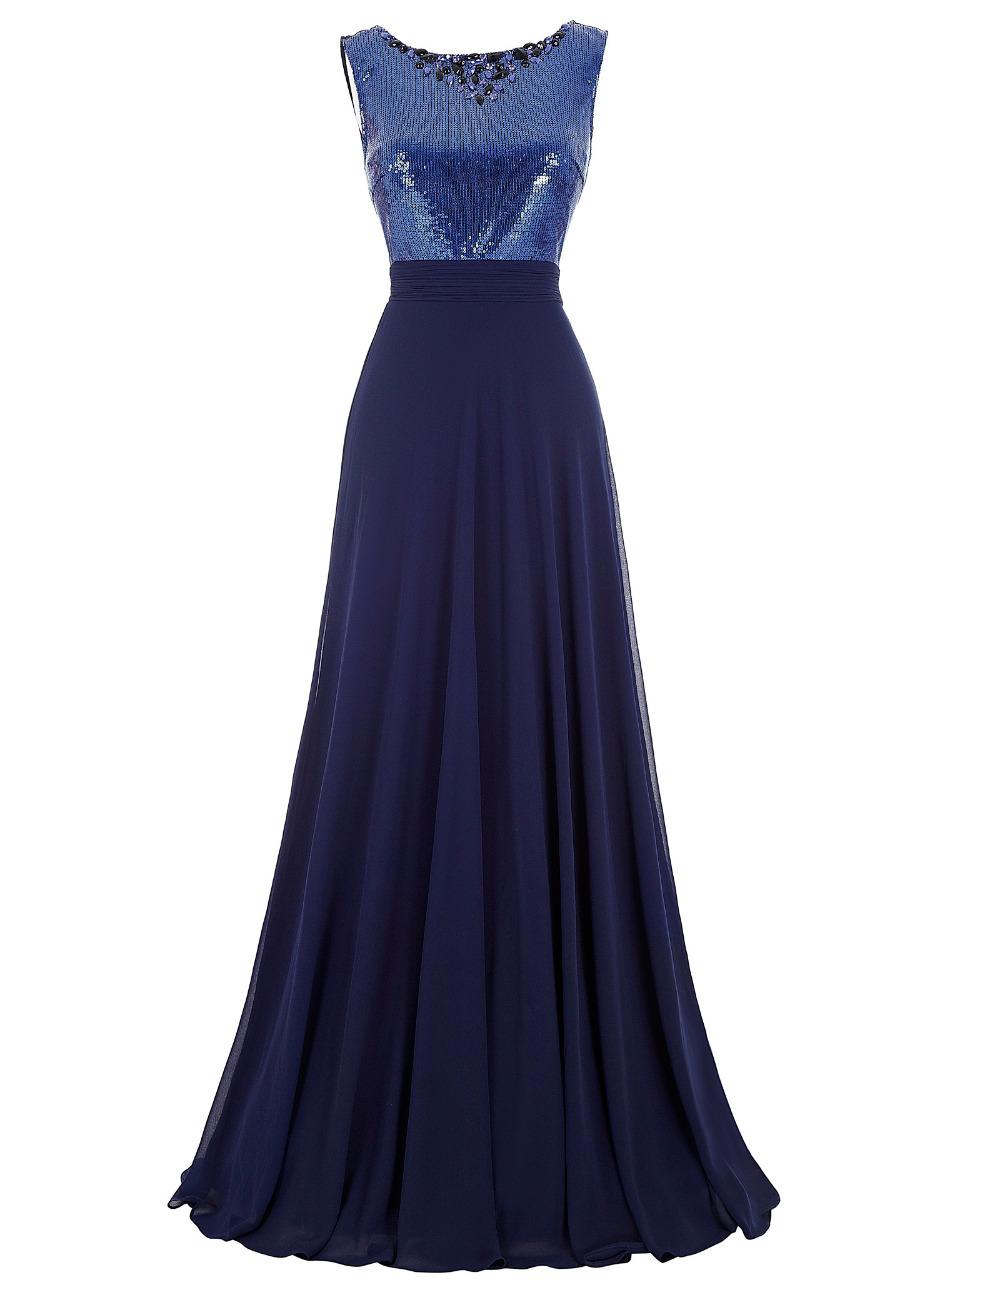 Western Junior Bridesmaid Dresses Long Navy Blue Wedding